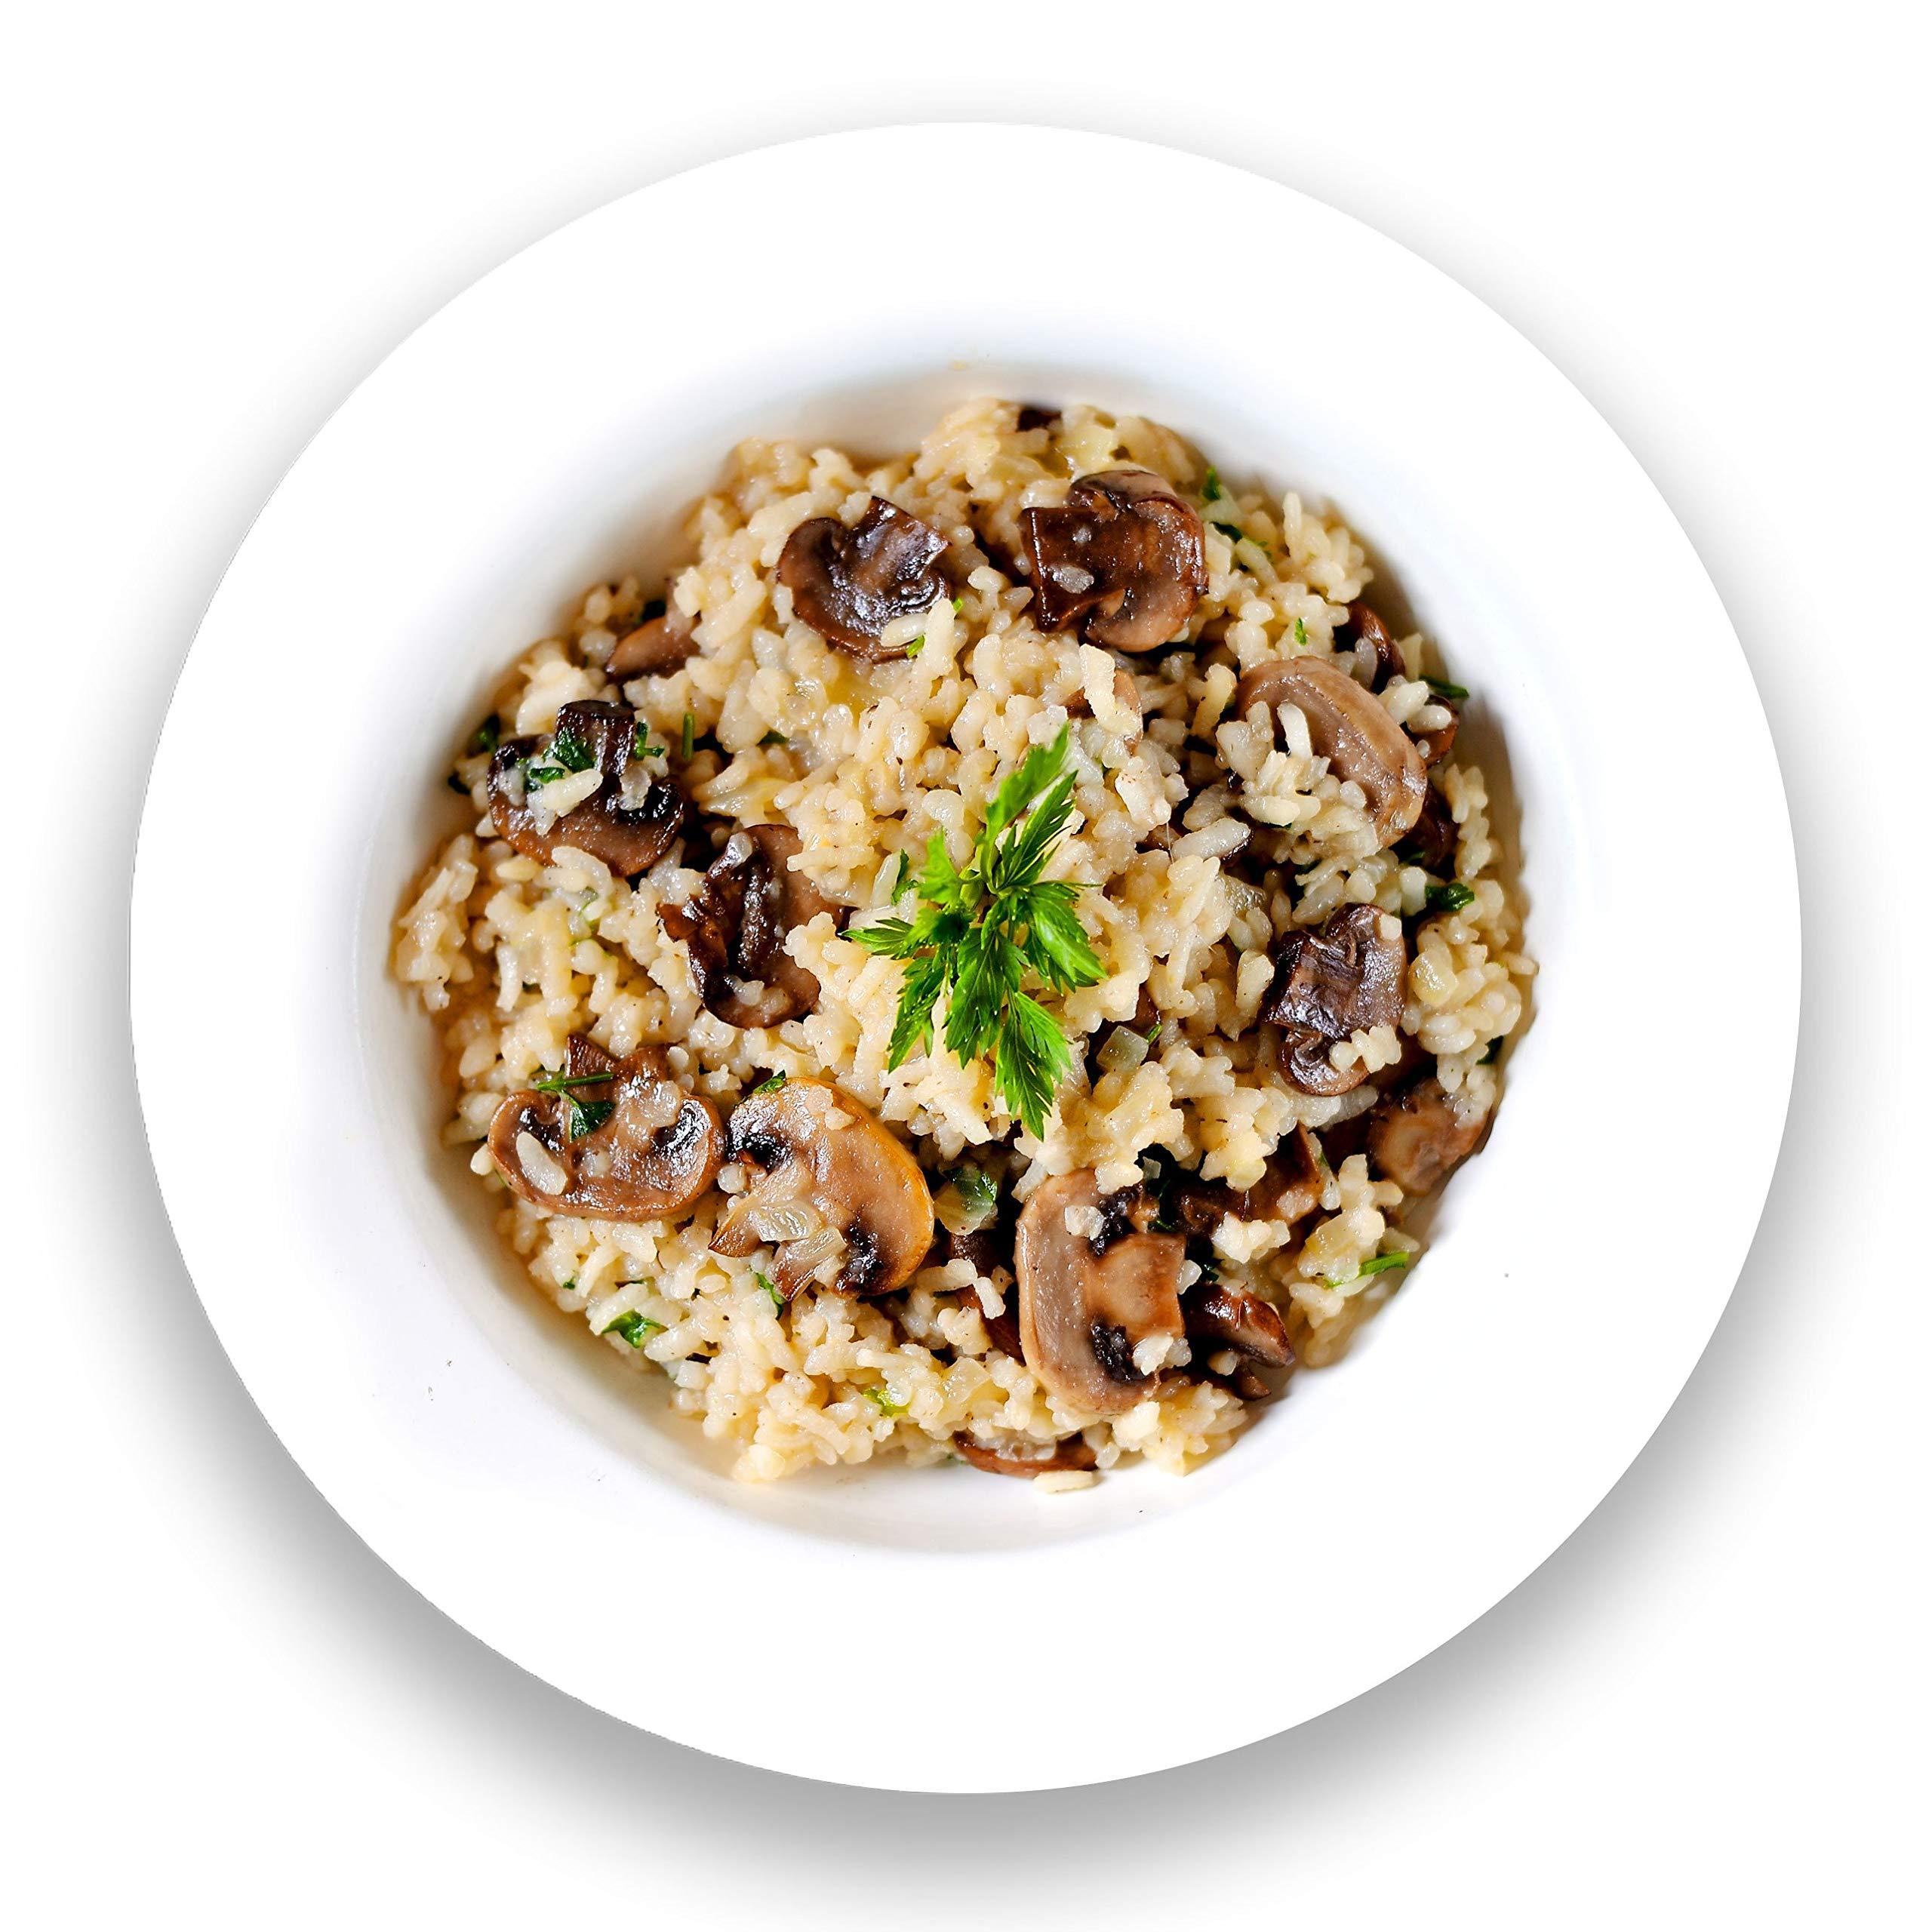 Takeout Kit, Italian Truffle Risotto Meal Kit, Serves 4